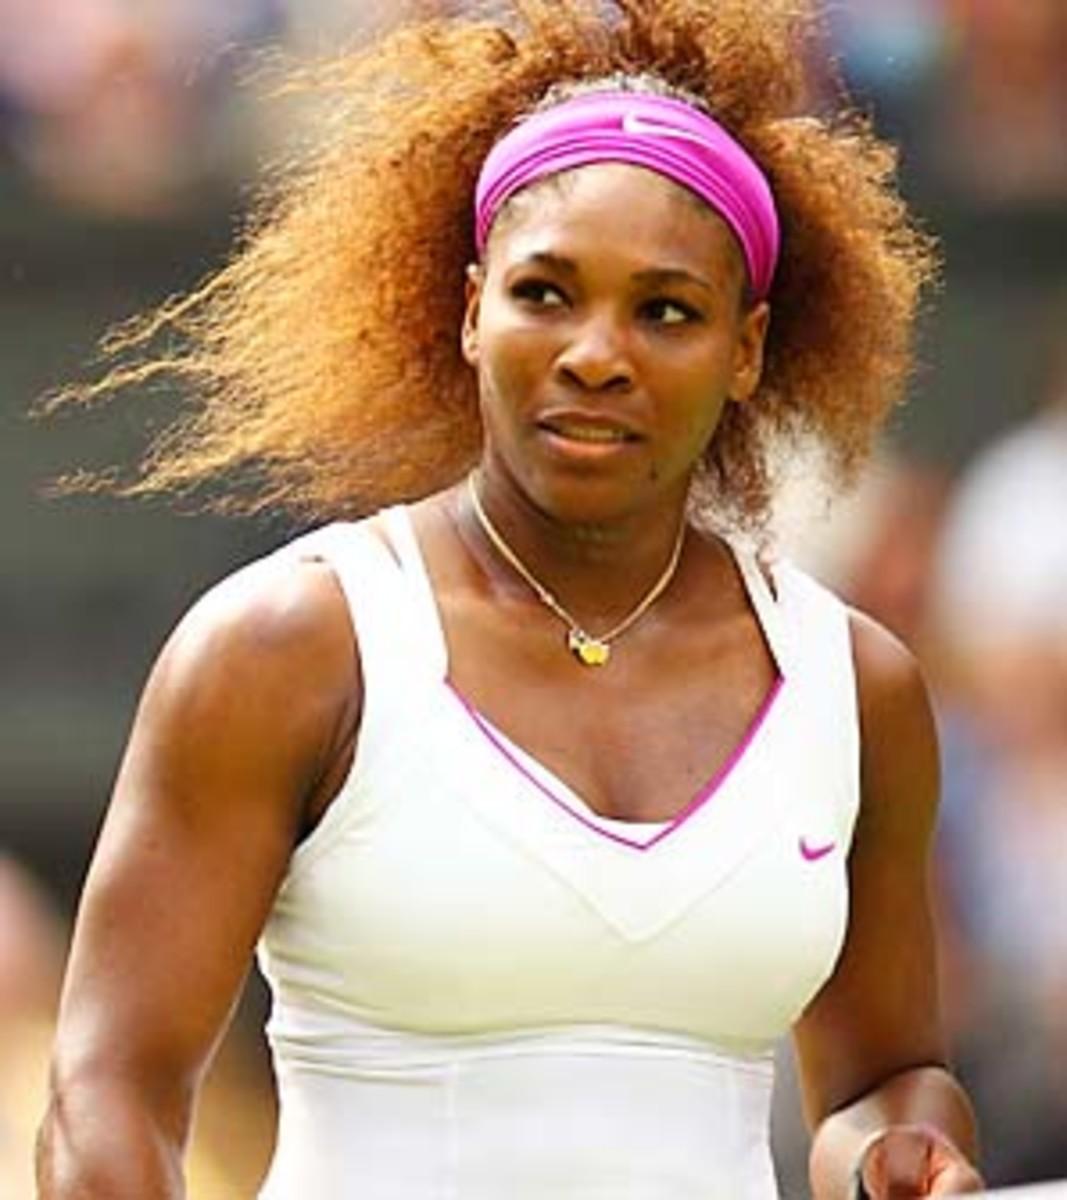 Serena Williams seeks her sixth title, which would put her three behind Martina Navratilova.